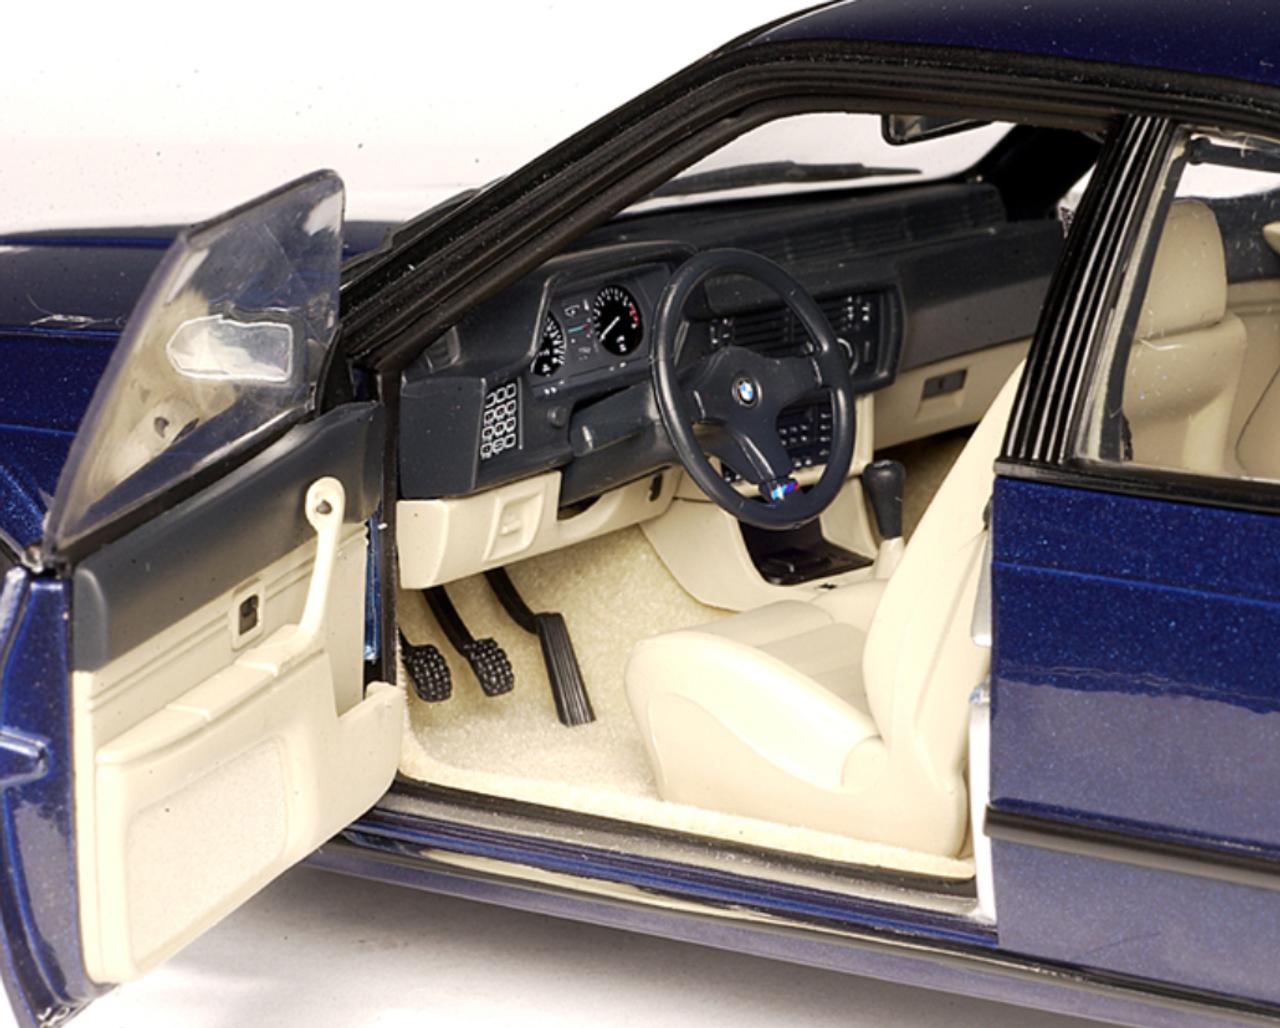 RARE 1/18 AUTOart BMW E24 M635Csi M635 Csi M6 (Royalblue Metallic) Diecast Car Model 70527